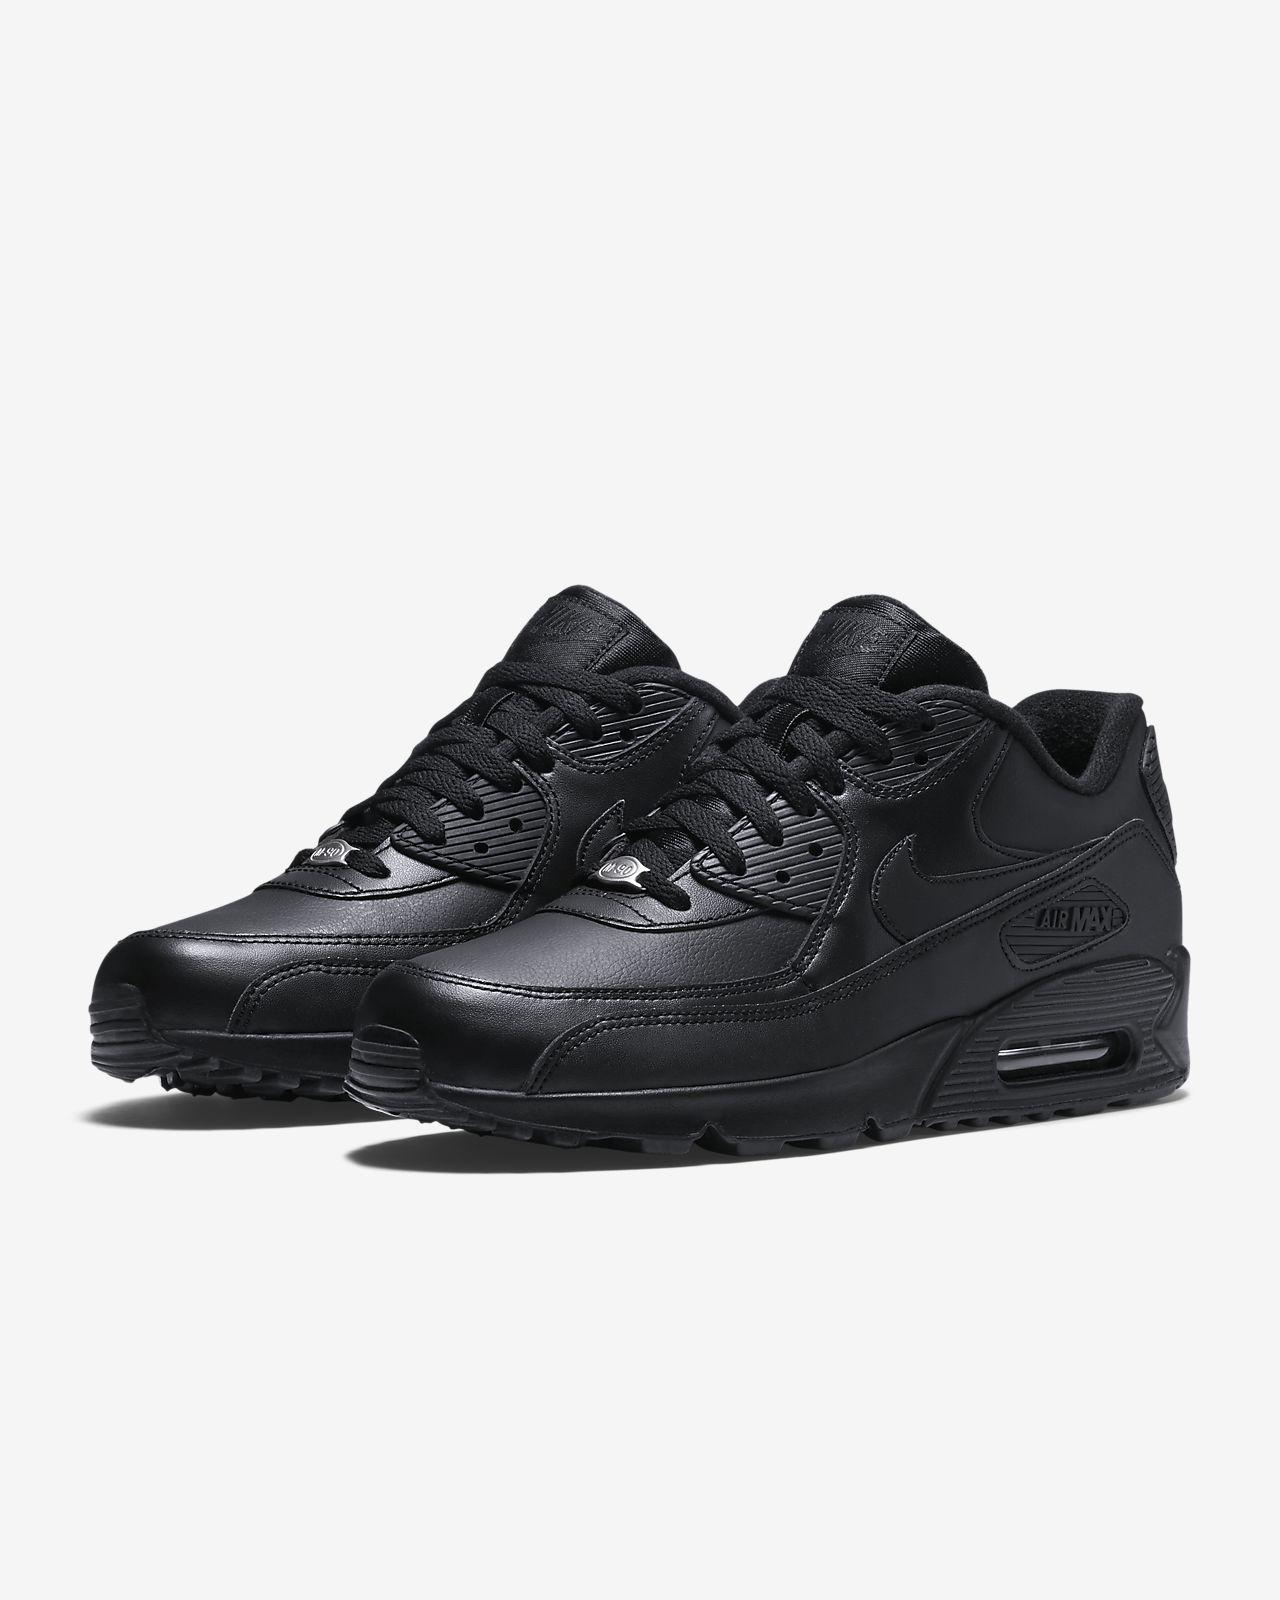 sale retailer 5497d 10776 ... Sko Nike Air Max 90 Leather för män